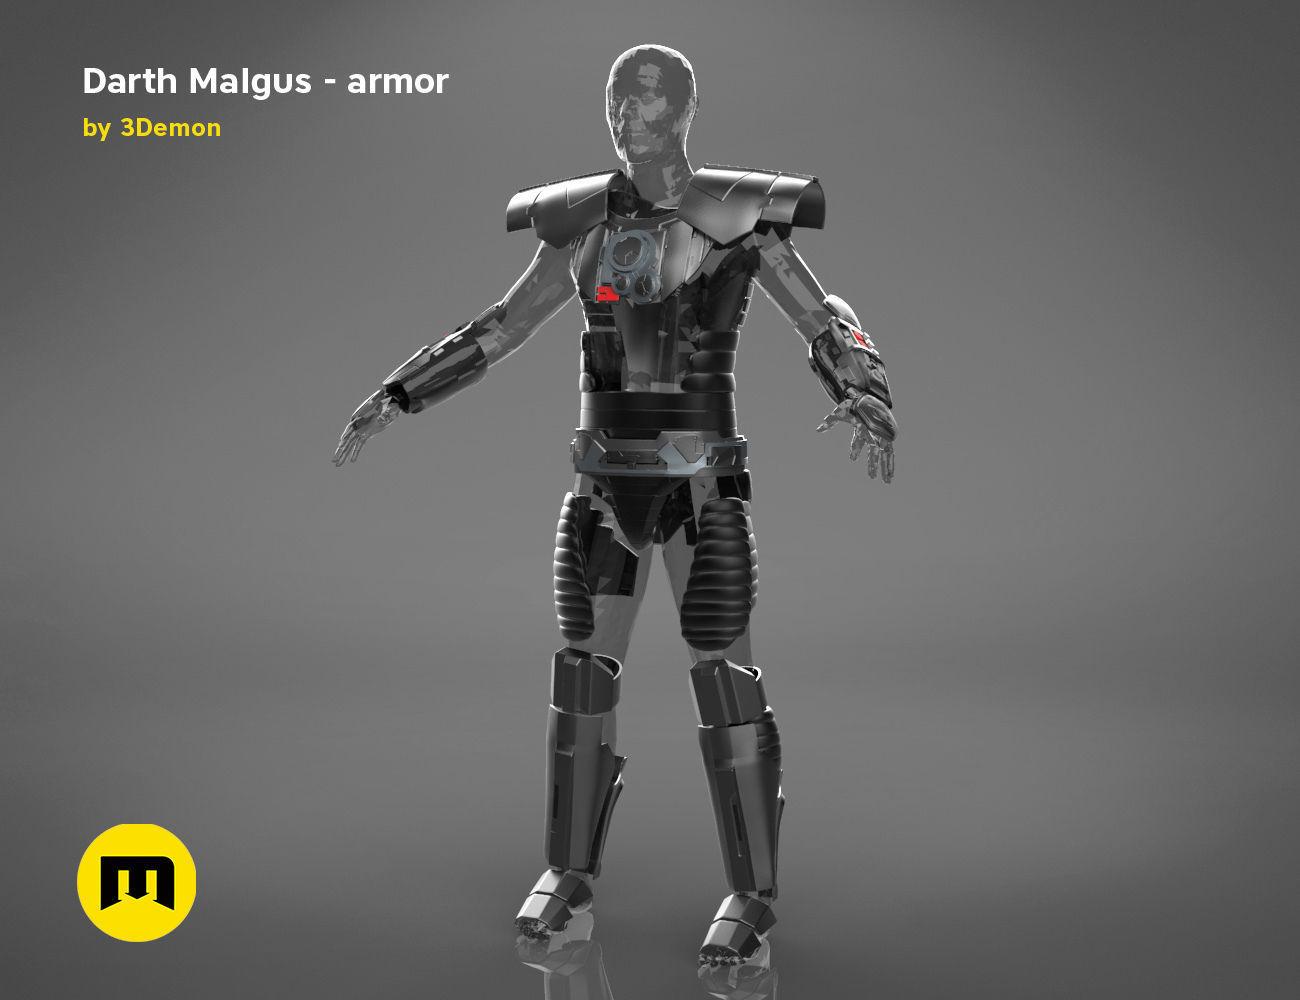 Darth Malgus armor - Star Wars